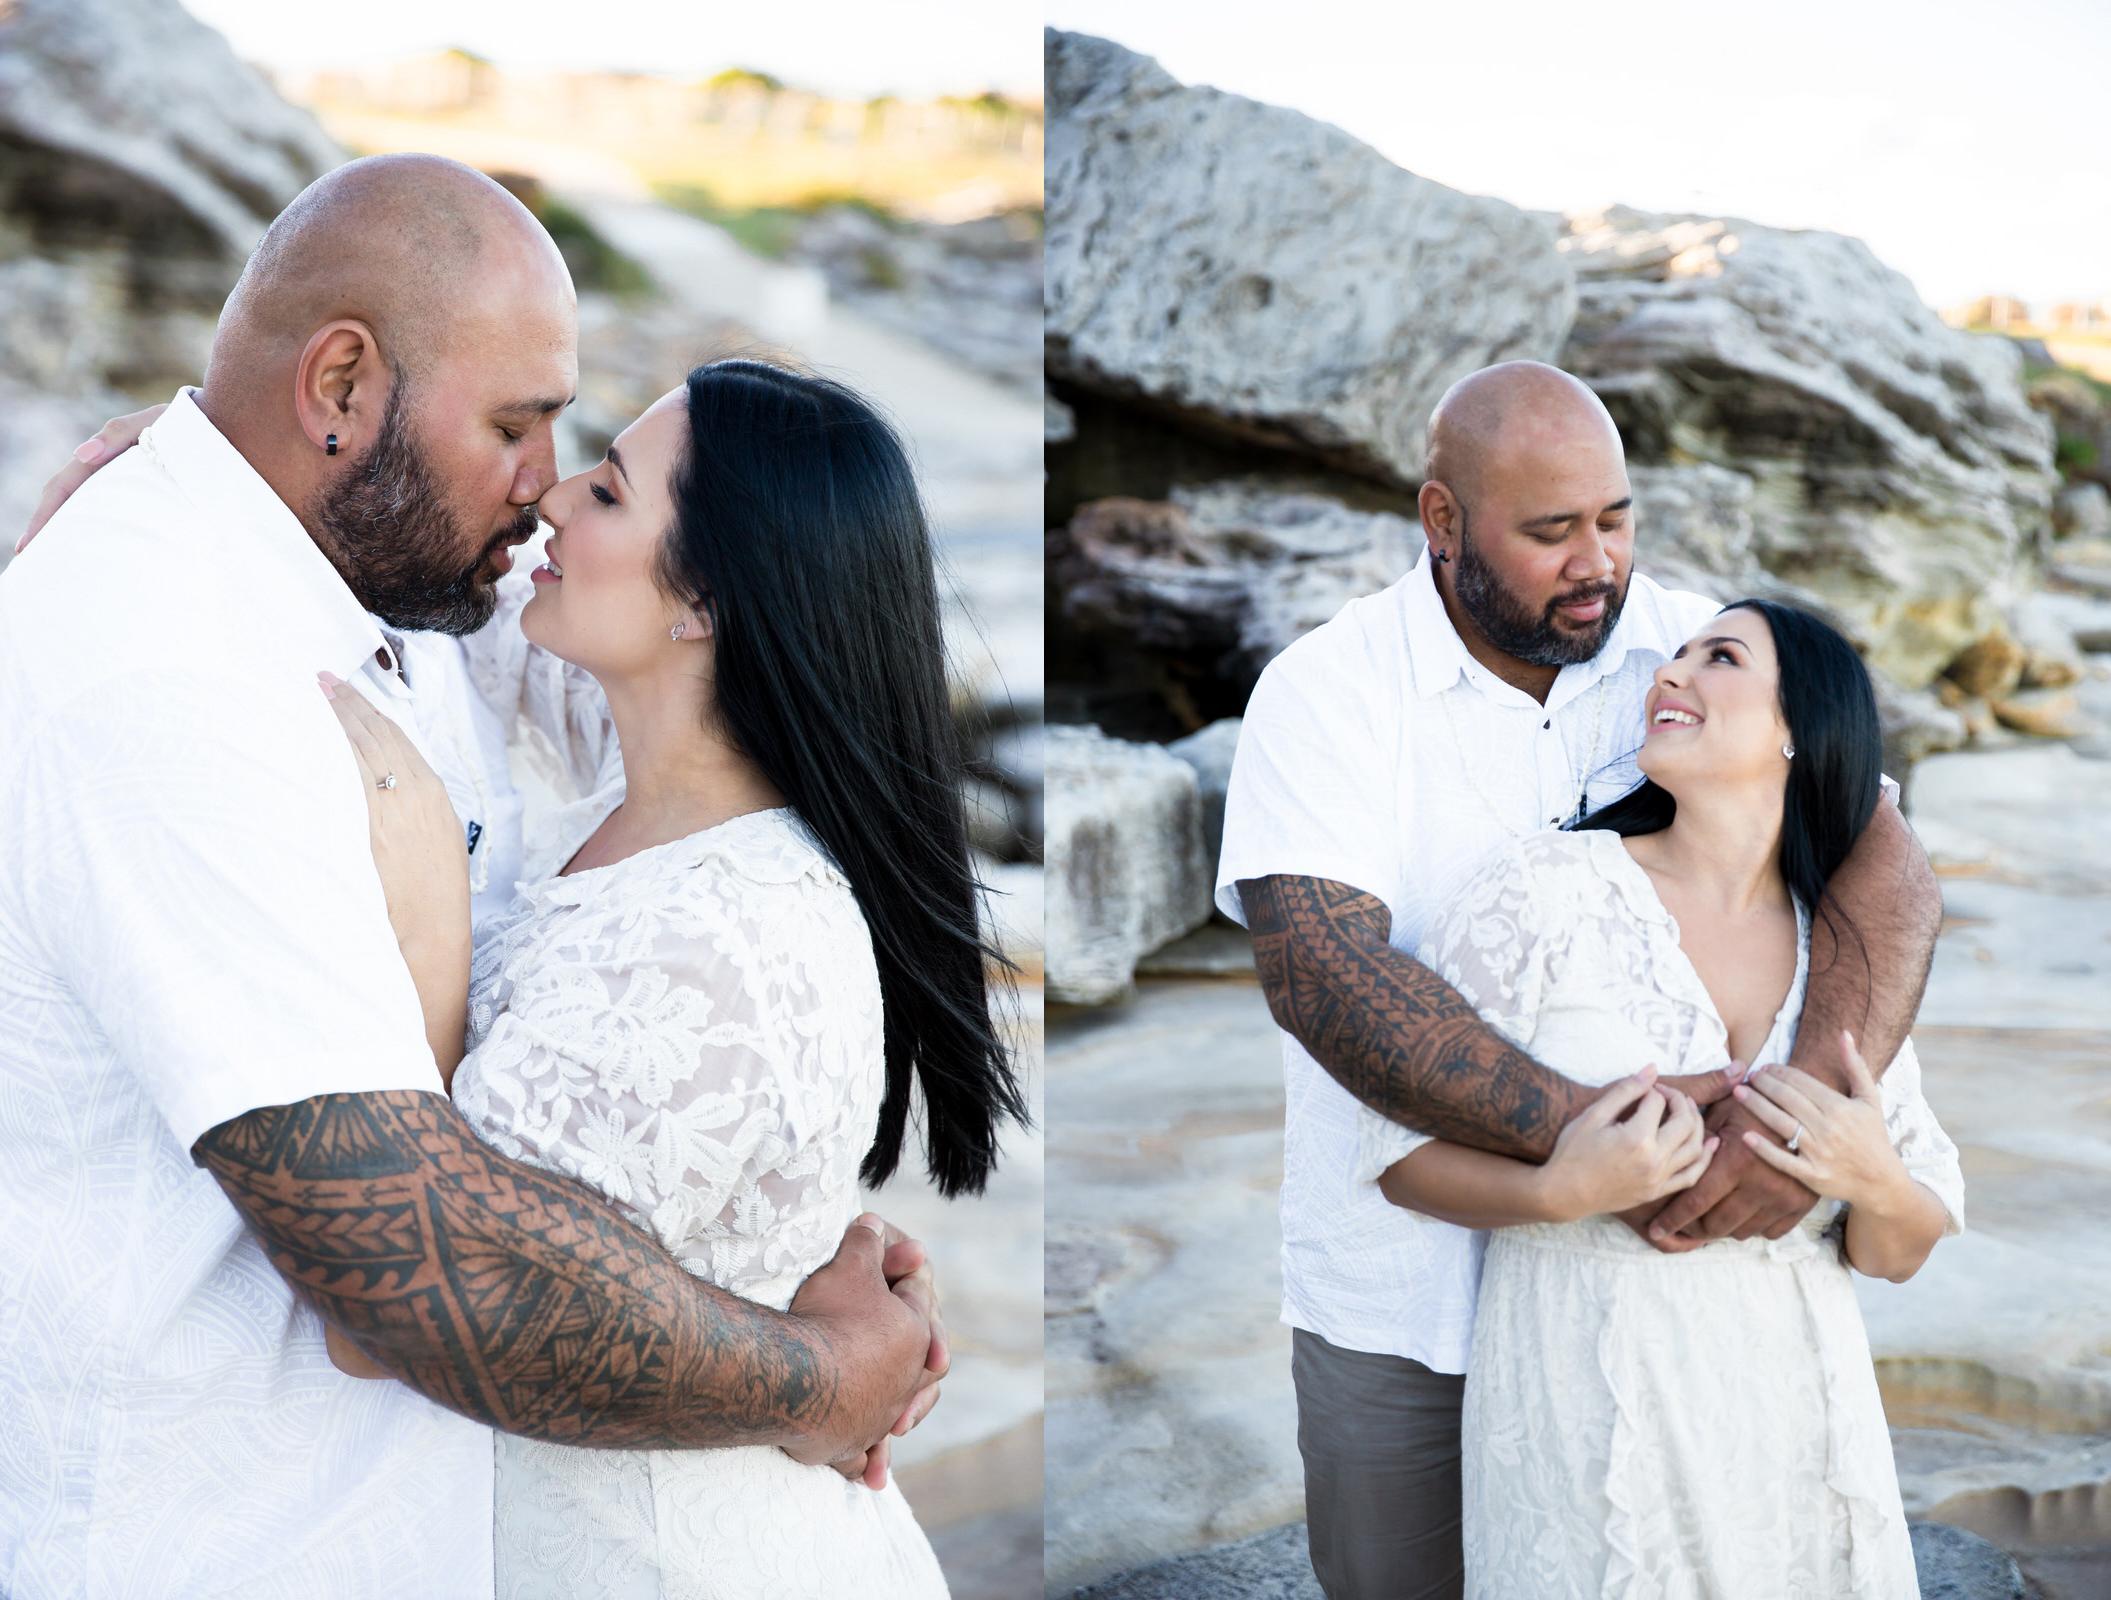 Sydney Wedding Photographer - Maroubra Beach - Jennifer Lam Photography (7).jpg